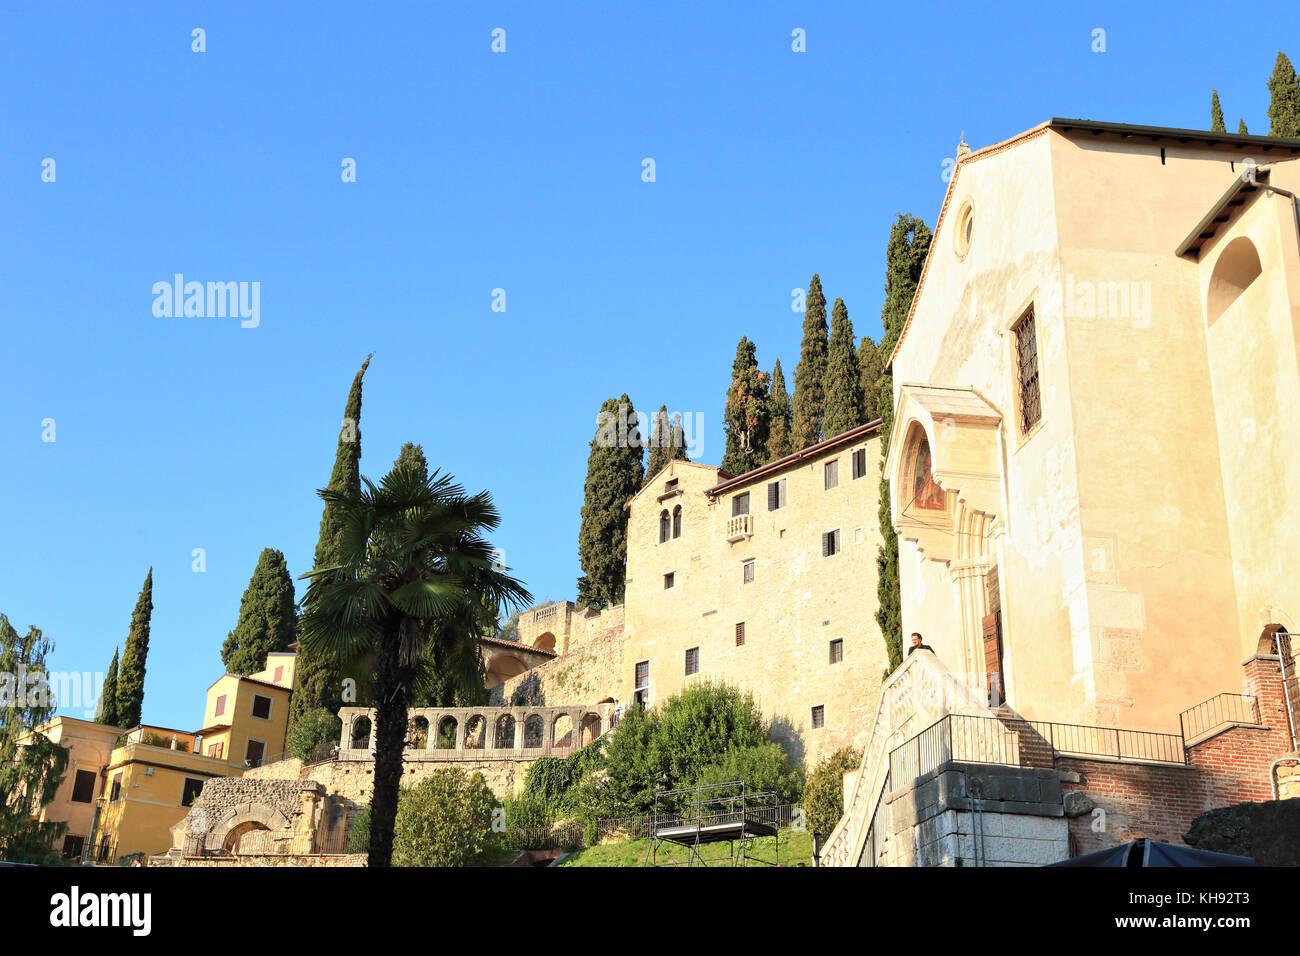 Saint Peter's Hill - Colle San Pietro - Stock Image